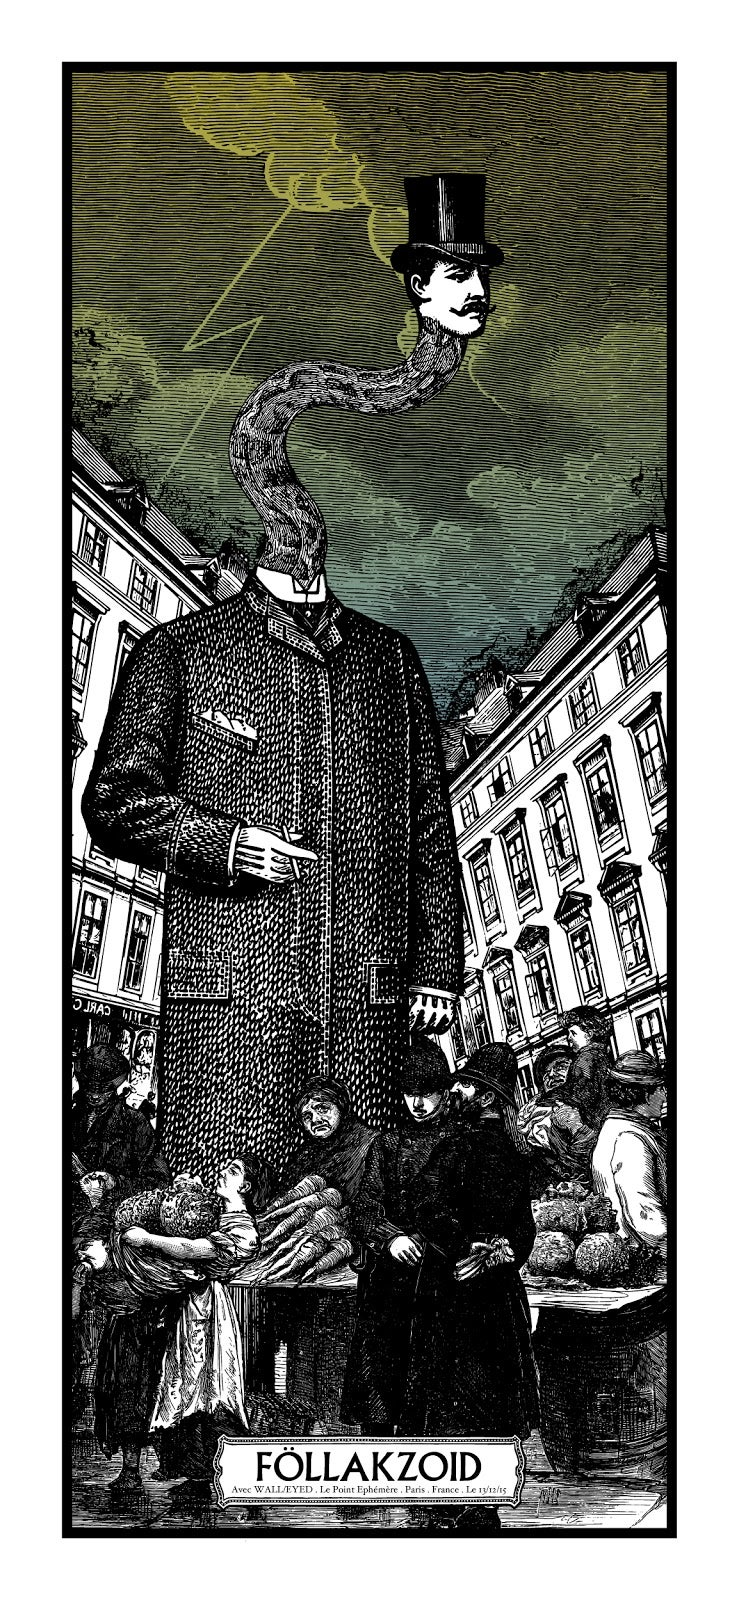 FOLLAKZOID gig poster - Le Point Ephémère Paris December 2015